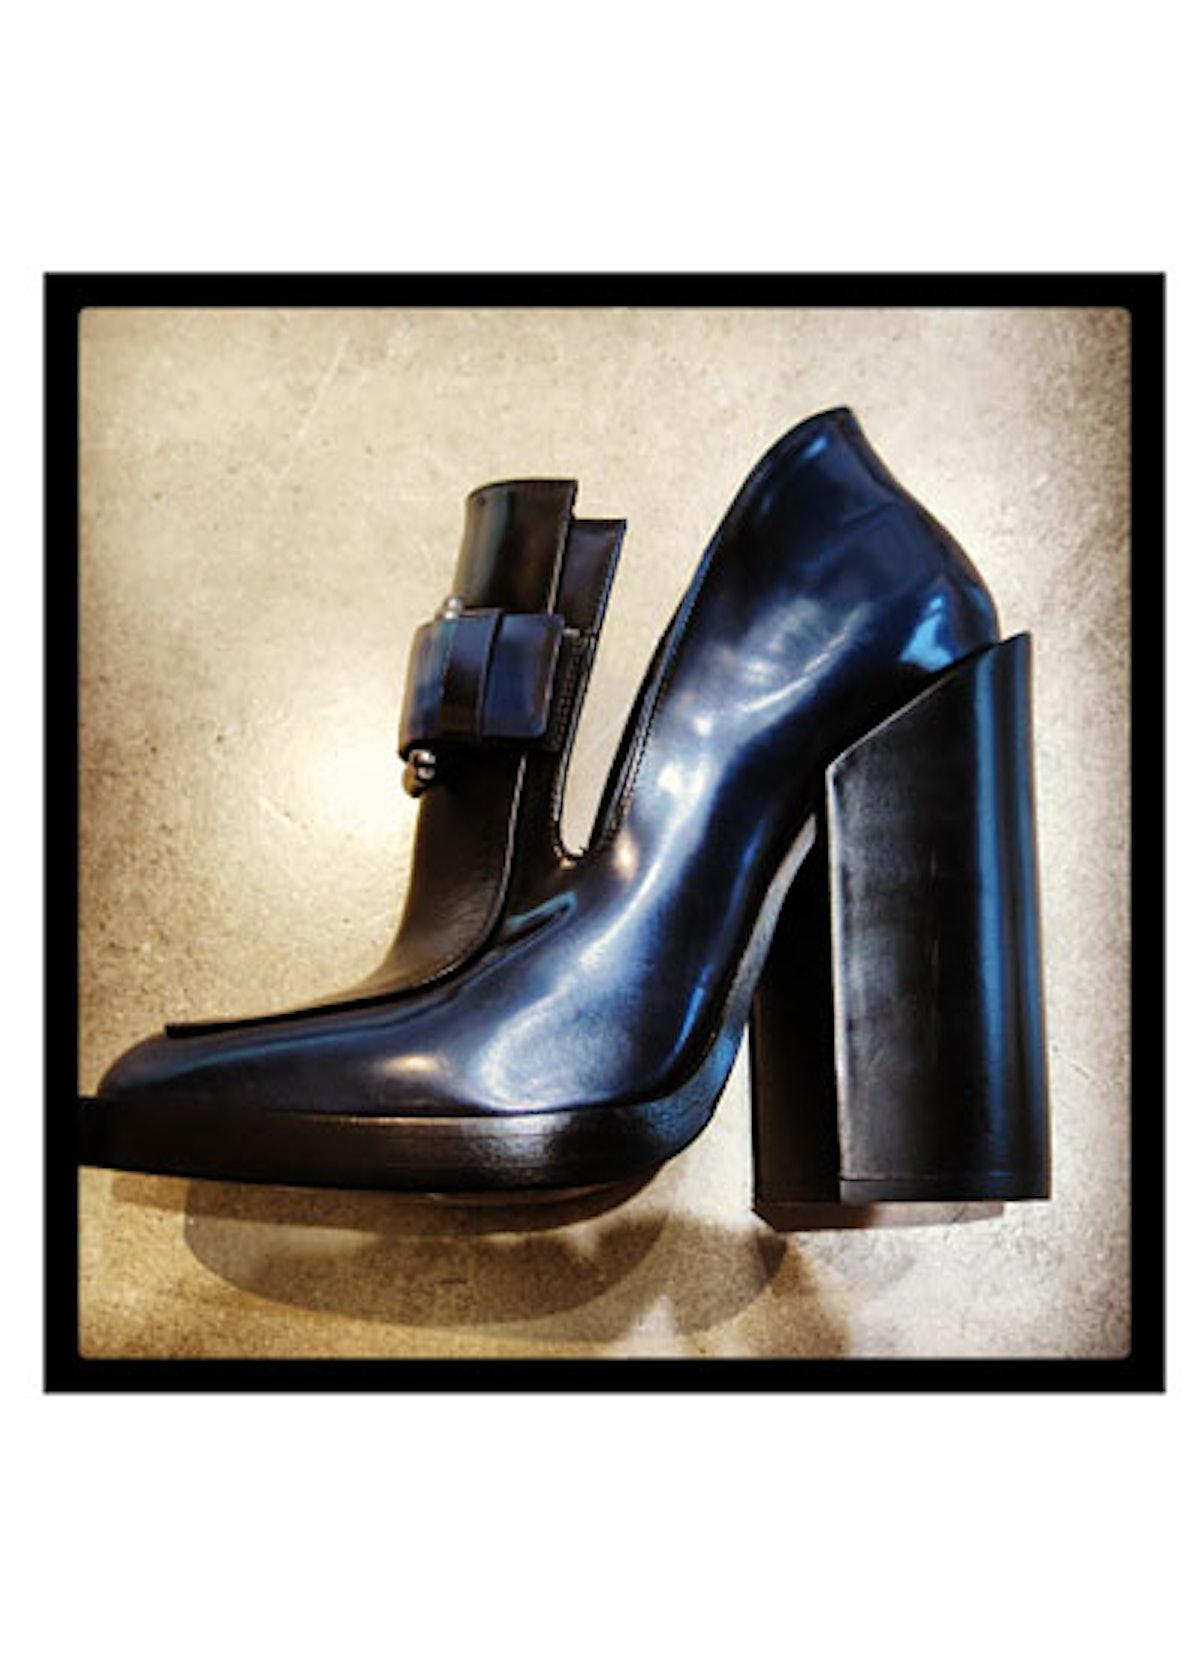 acss-best-shoes-fall-2013-08-v.jpg